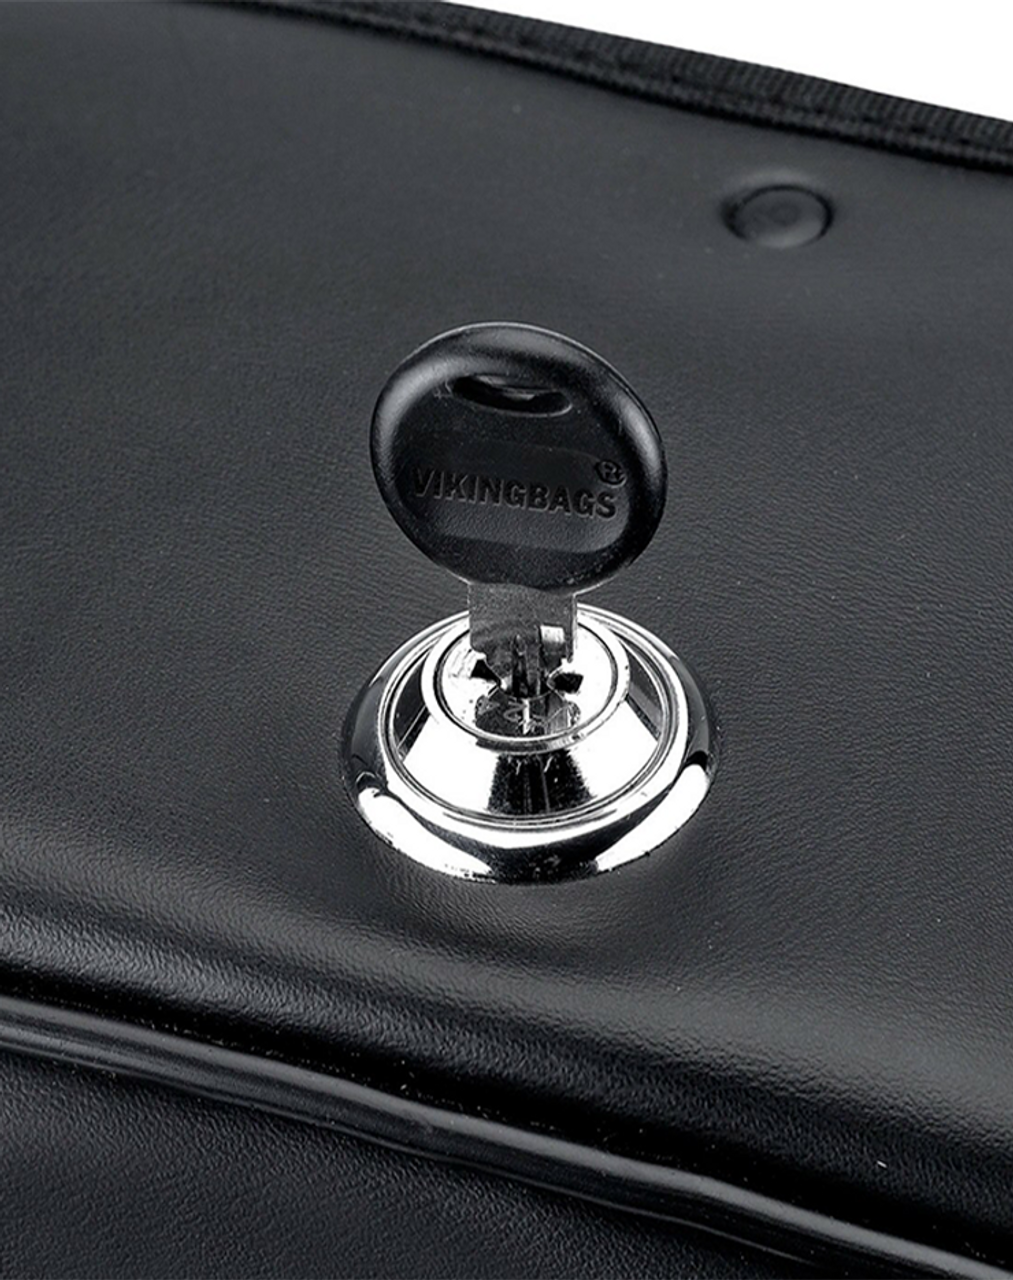 Honda VTX 1800 N Shock Cutout Slanted Studded Large Motorcycle Saddlebags Key Lock View